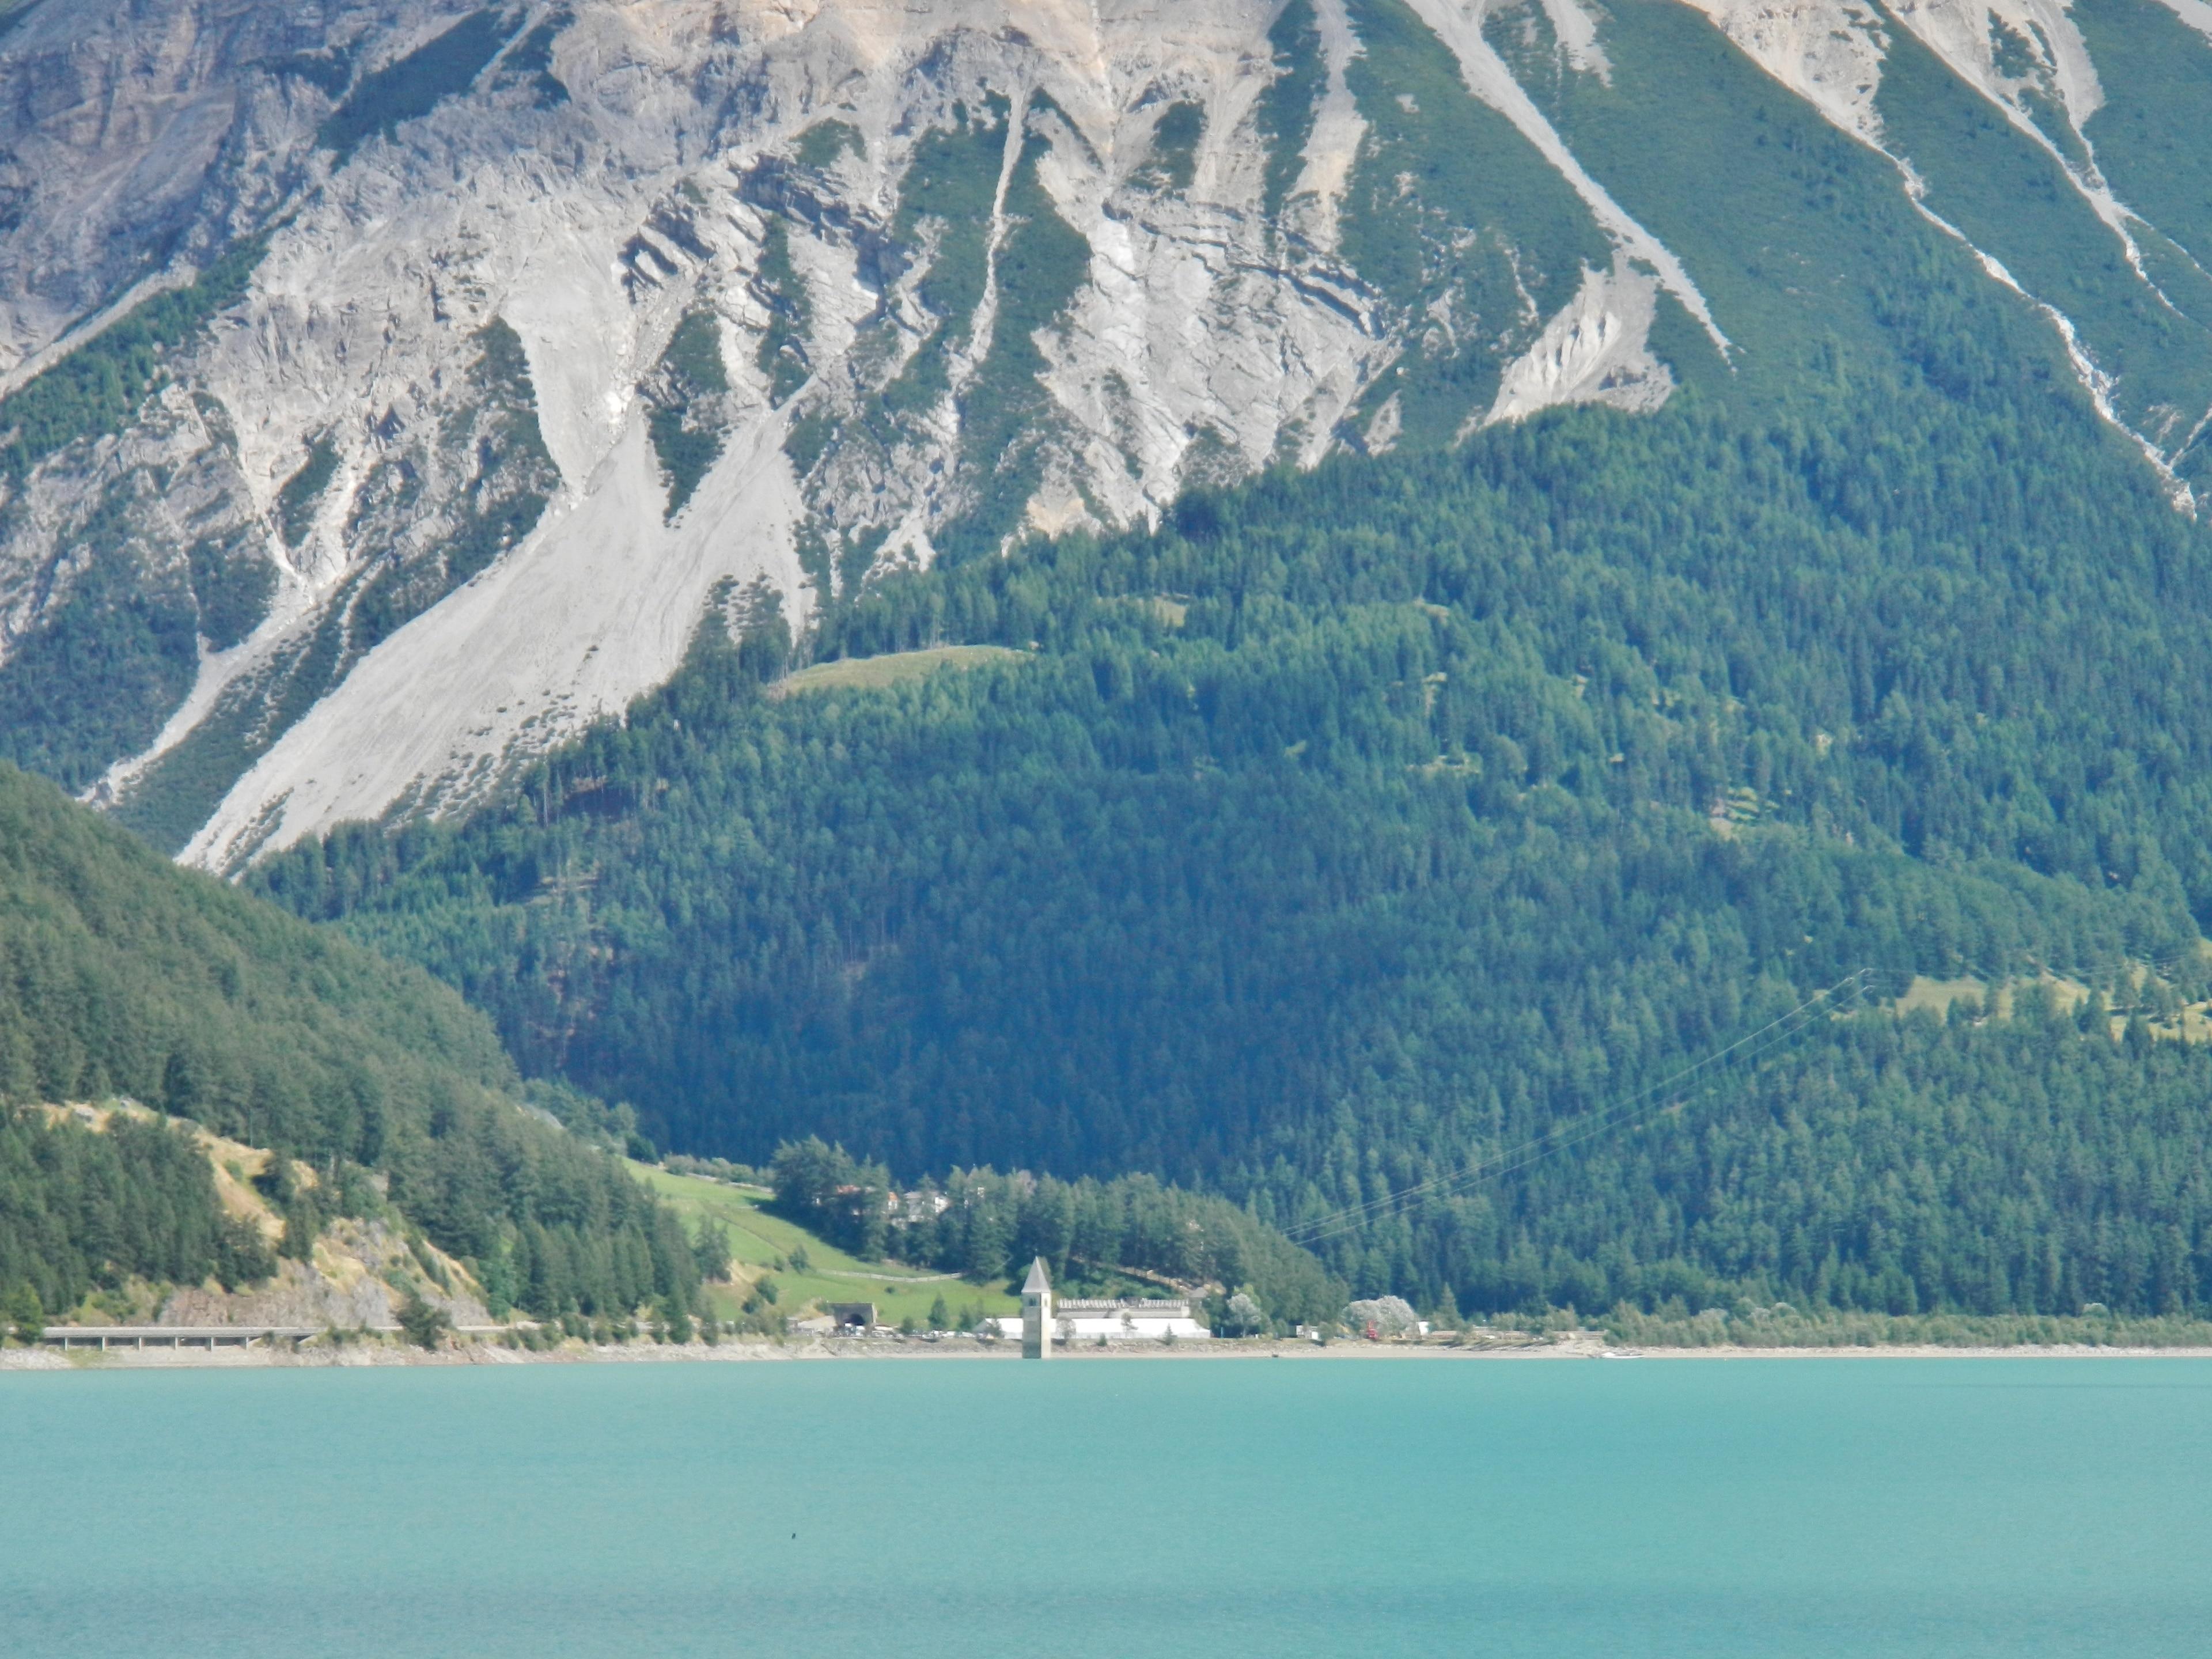 Lago di Resia, Curon Venosta, Trentino-Zuid-Tirol, Italië